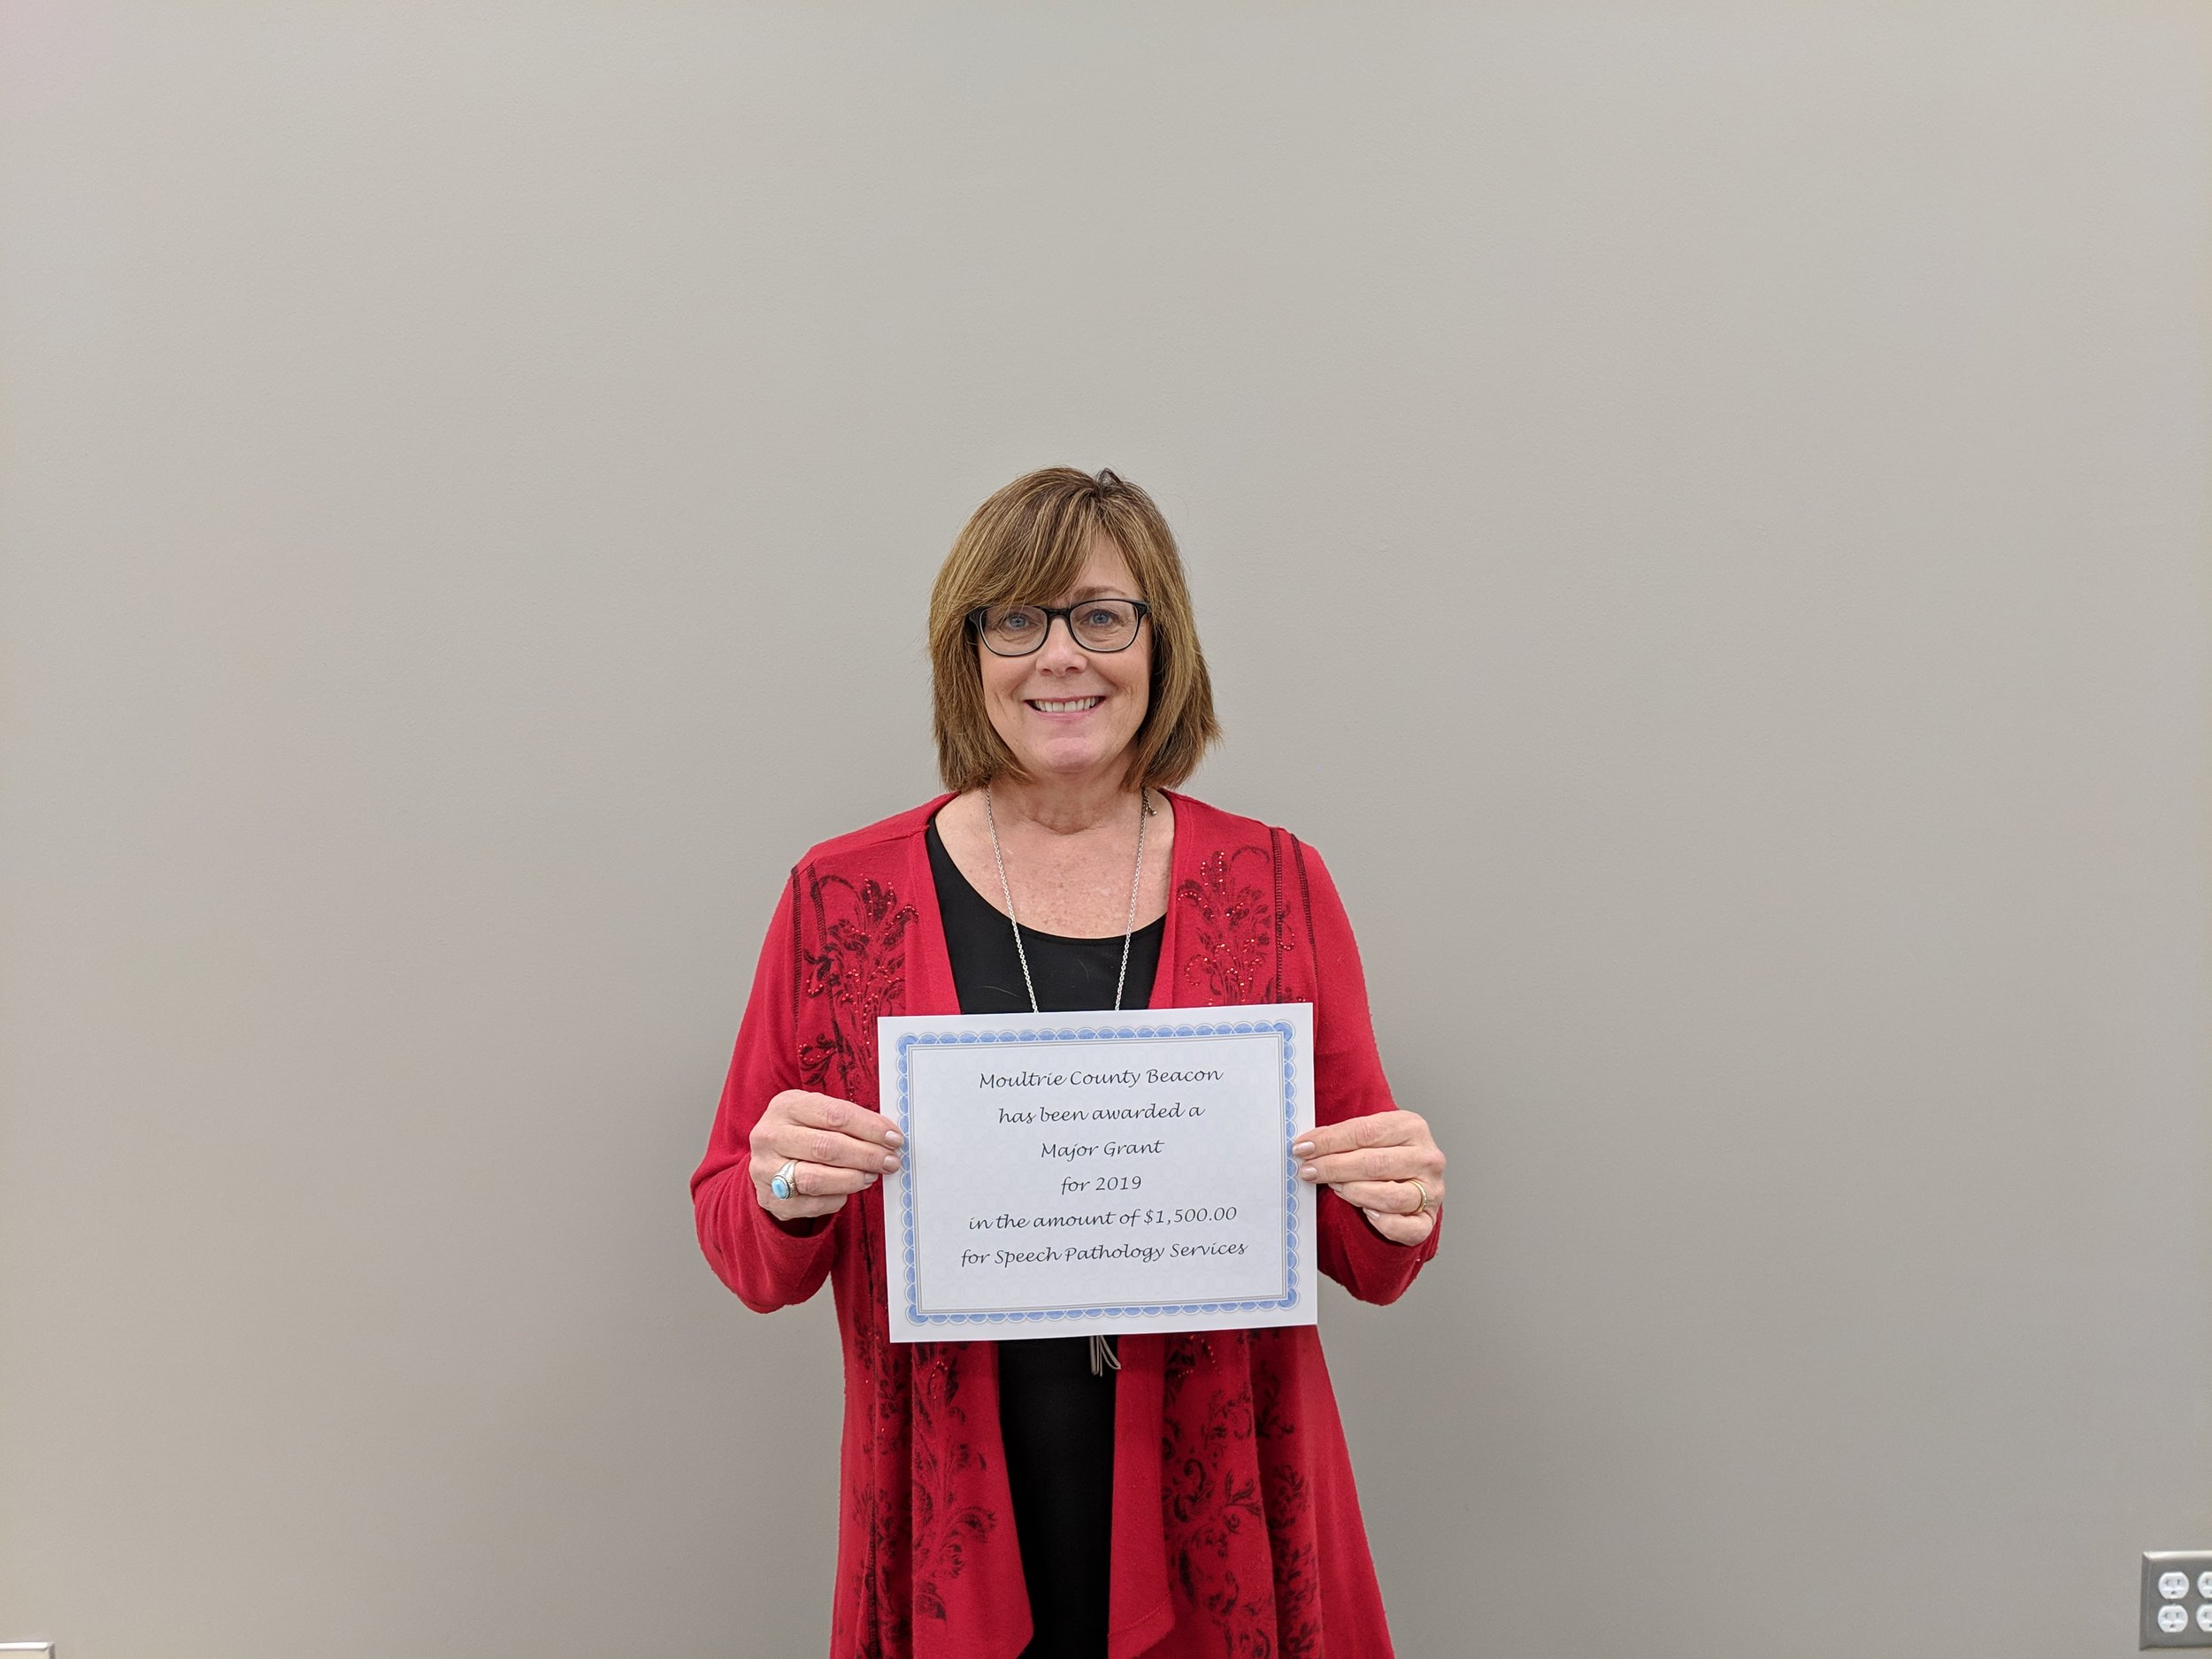 $1,500.00   Moultrie County Beacon - Susan Rauch  Speech - Language Pathologist Services  Major Grant